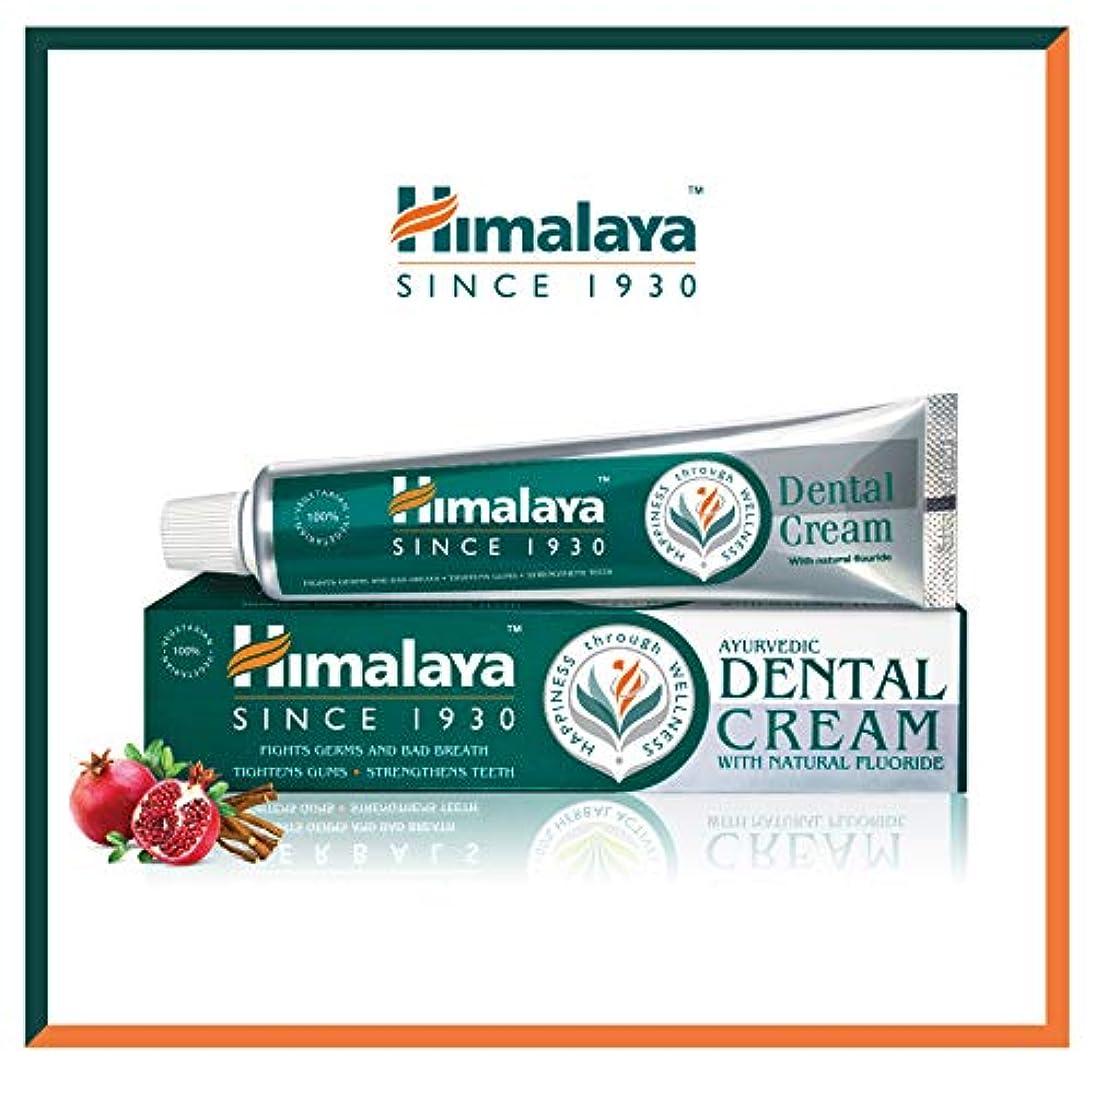 一目七時半実現可能Himalaya Complete Care Toothpaste 100g